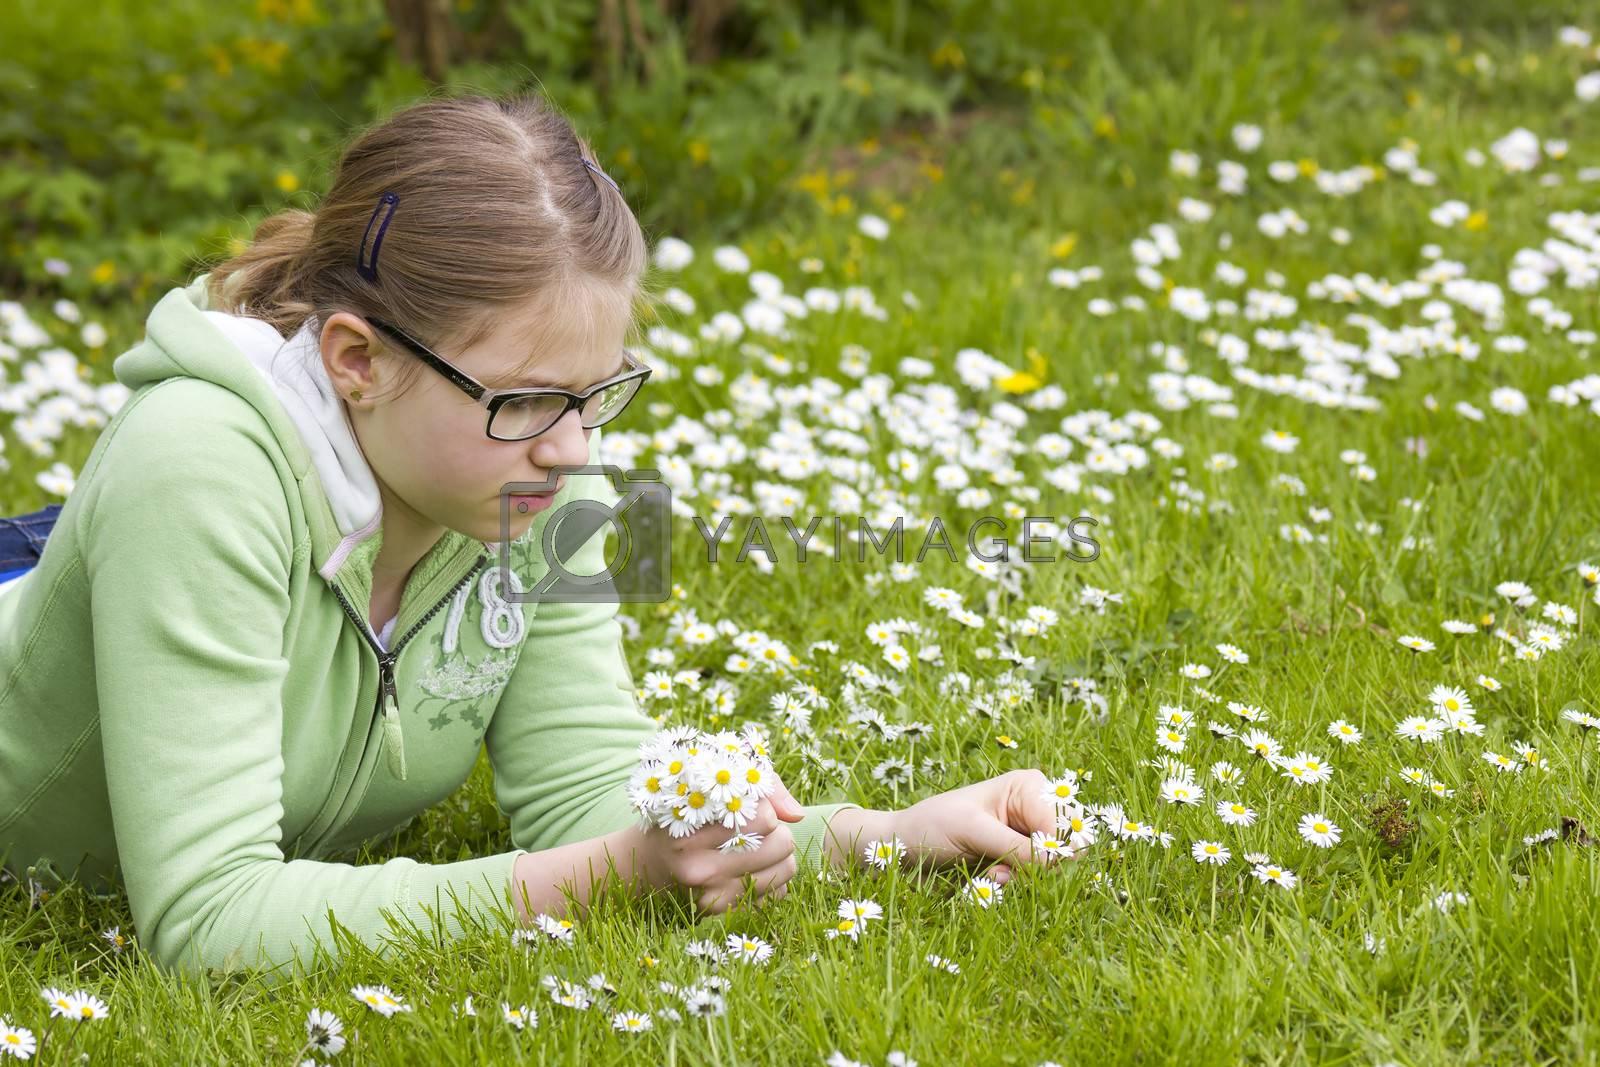 young girl picking daisies by miradrozdowski